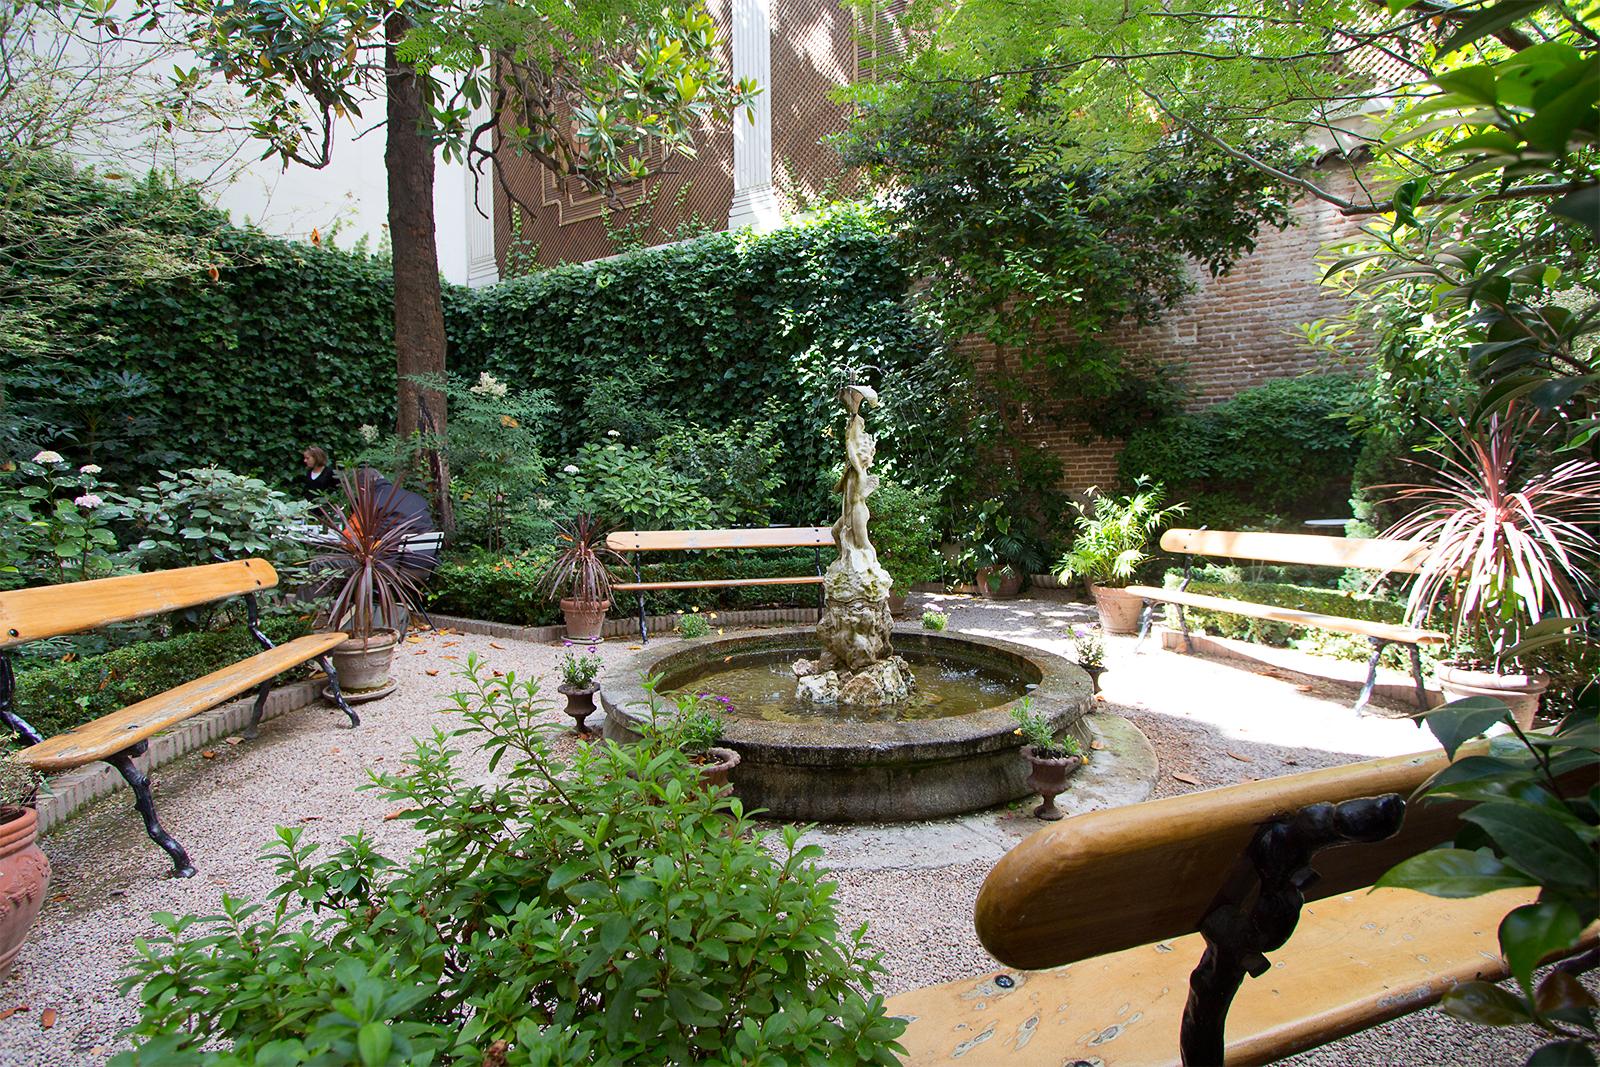 Madrid cool blog jardin museo romanticismo g madrid cool for Jardin romantico